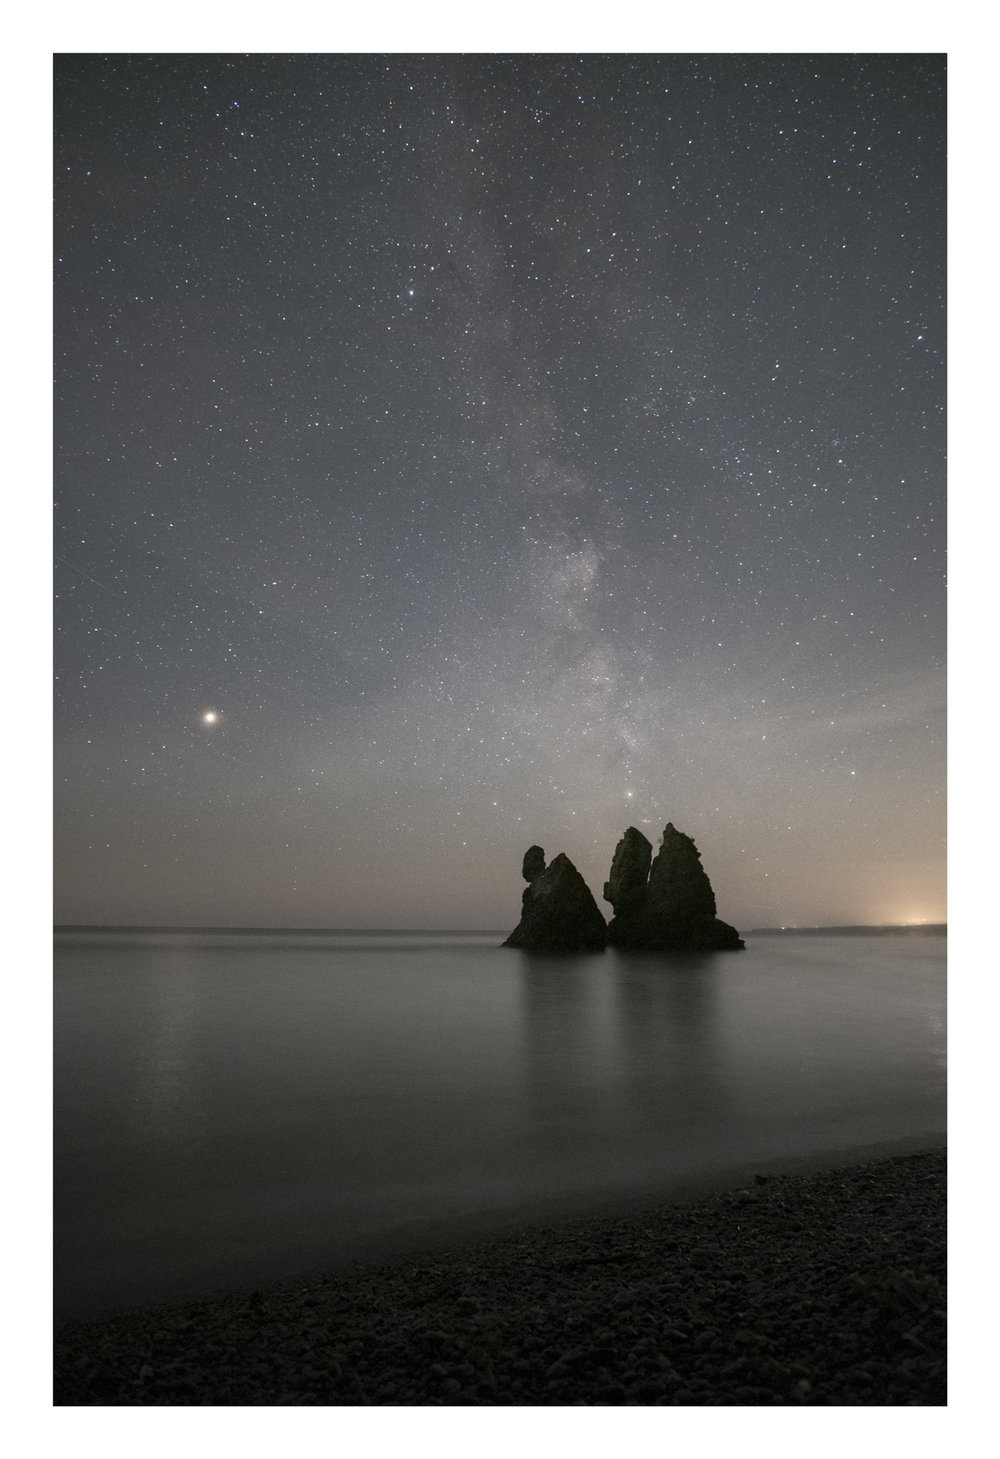 Milkyway 5 copper coast astrophotography